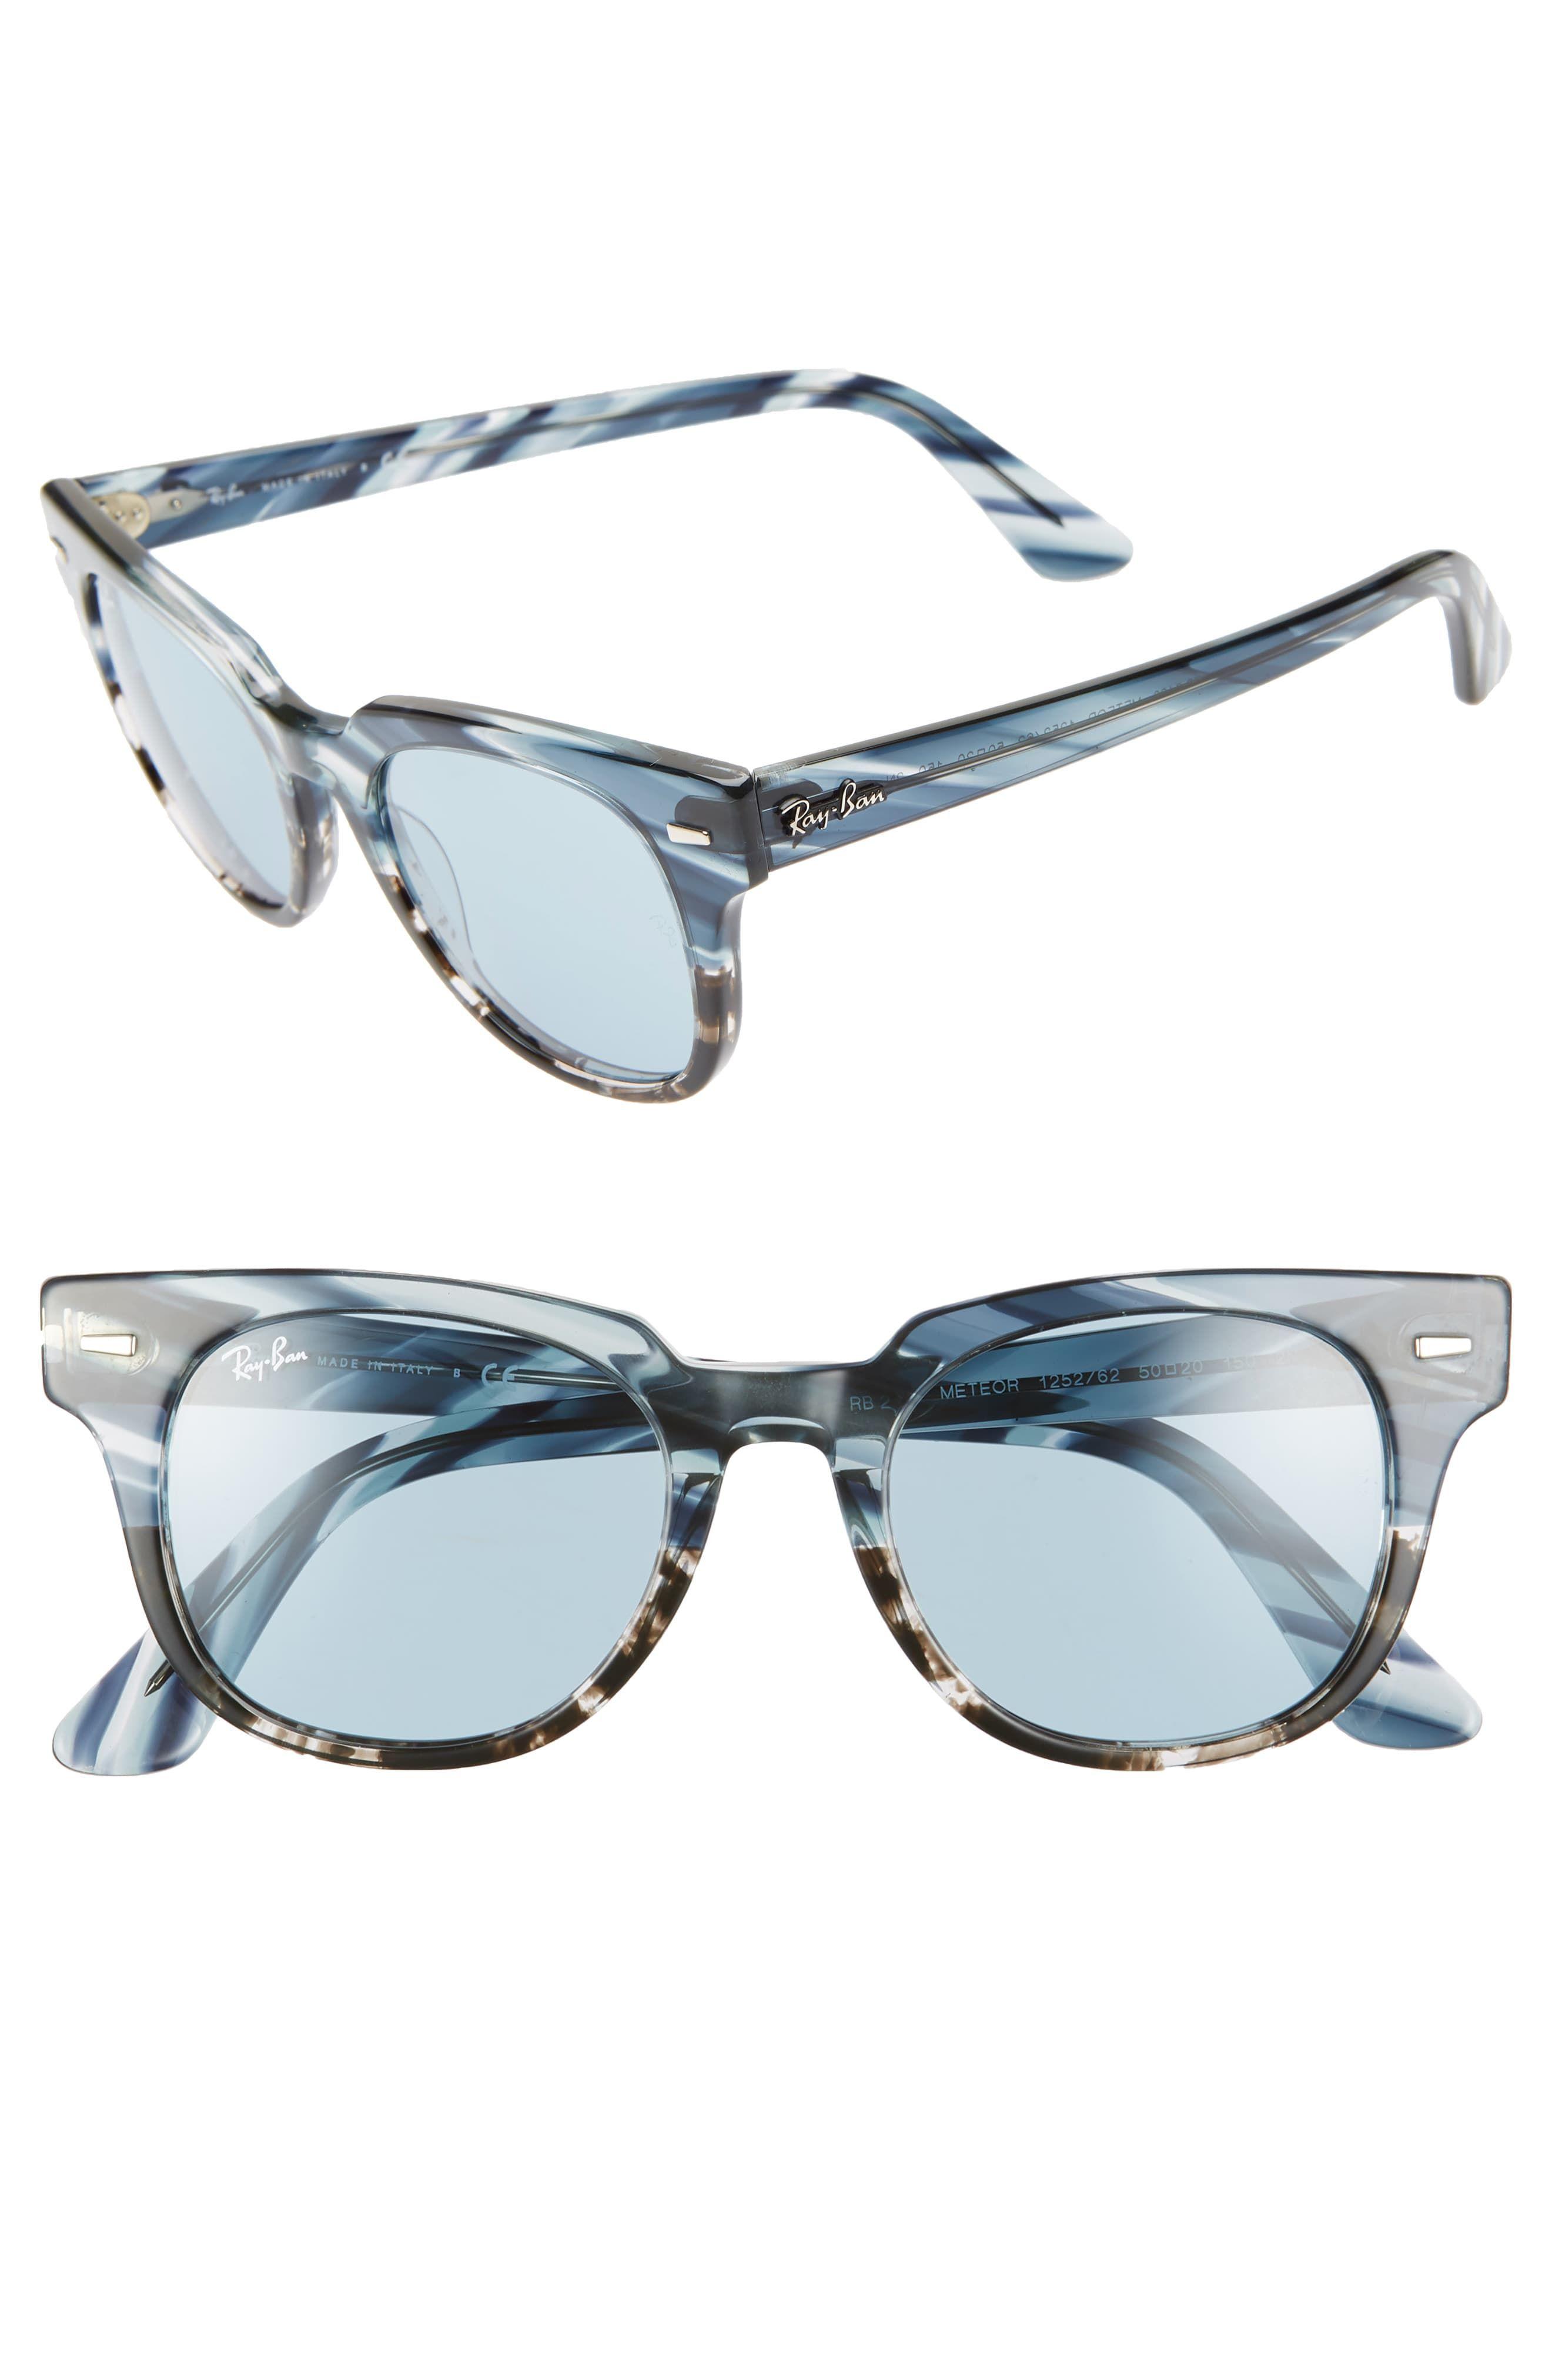 Ray Ban Wayfarer 50mm Square Sunglasses Rayban Wayfarer Sunglasses Square Sunglasses